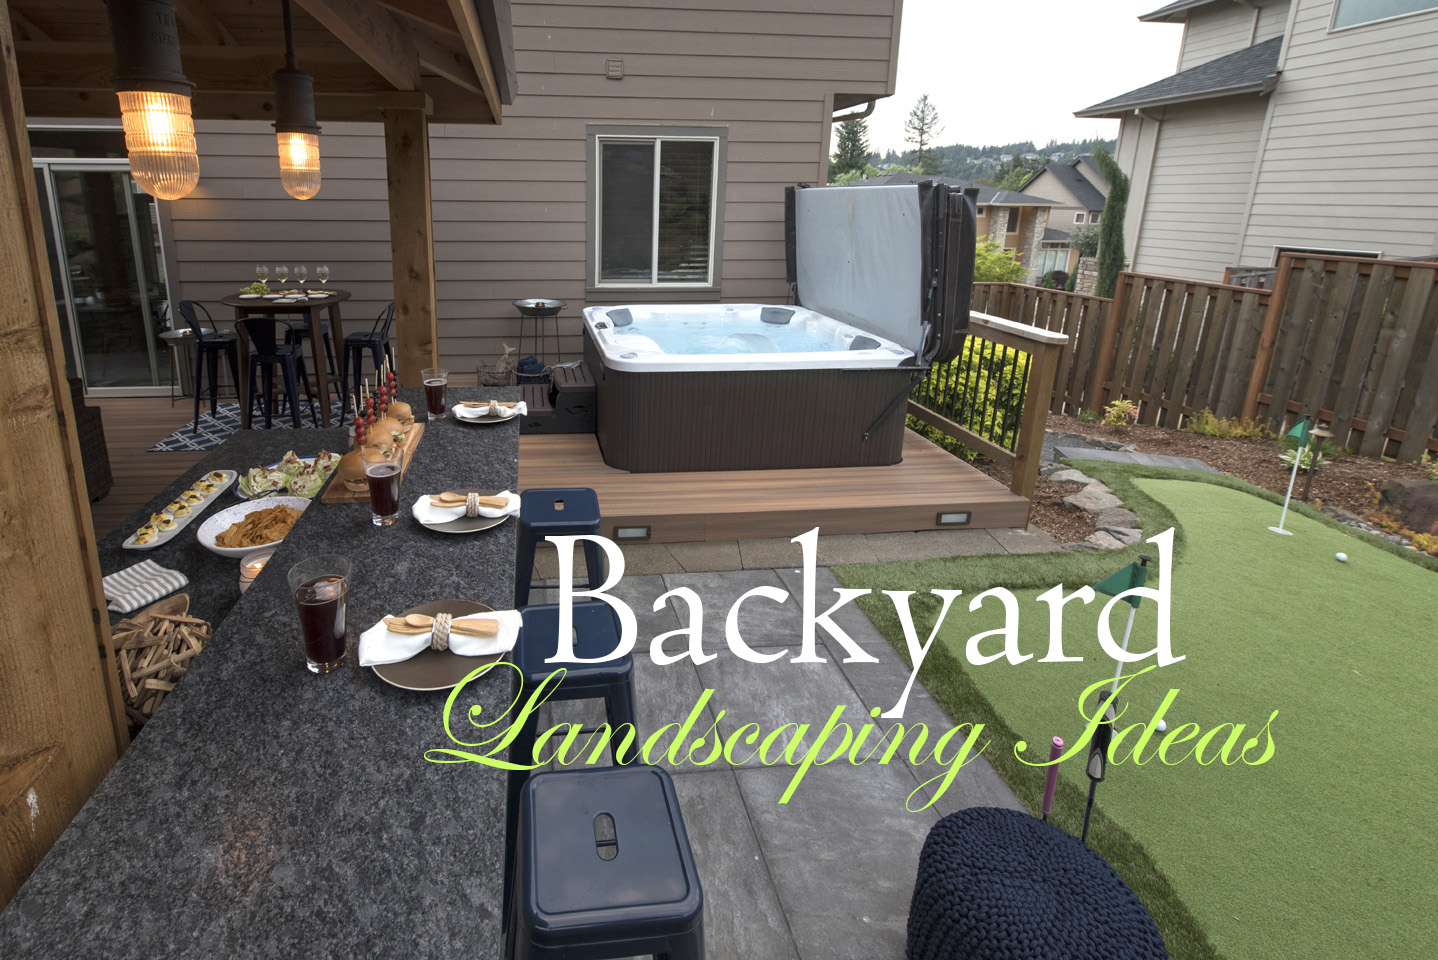 backyard landscaping ideas paradise restored landscaping